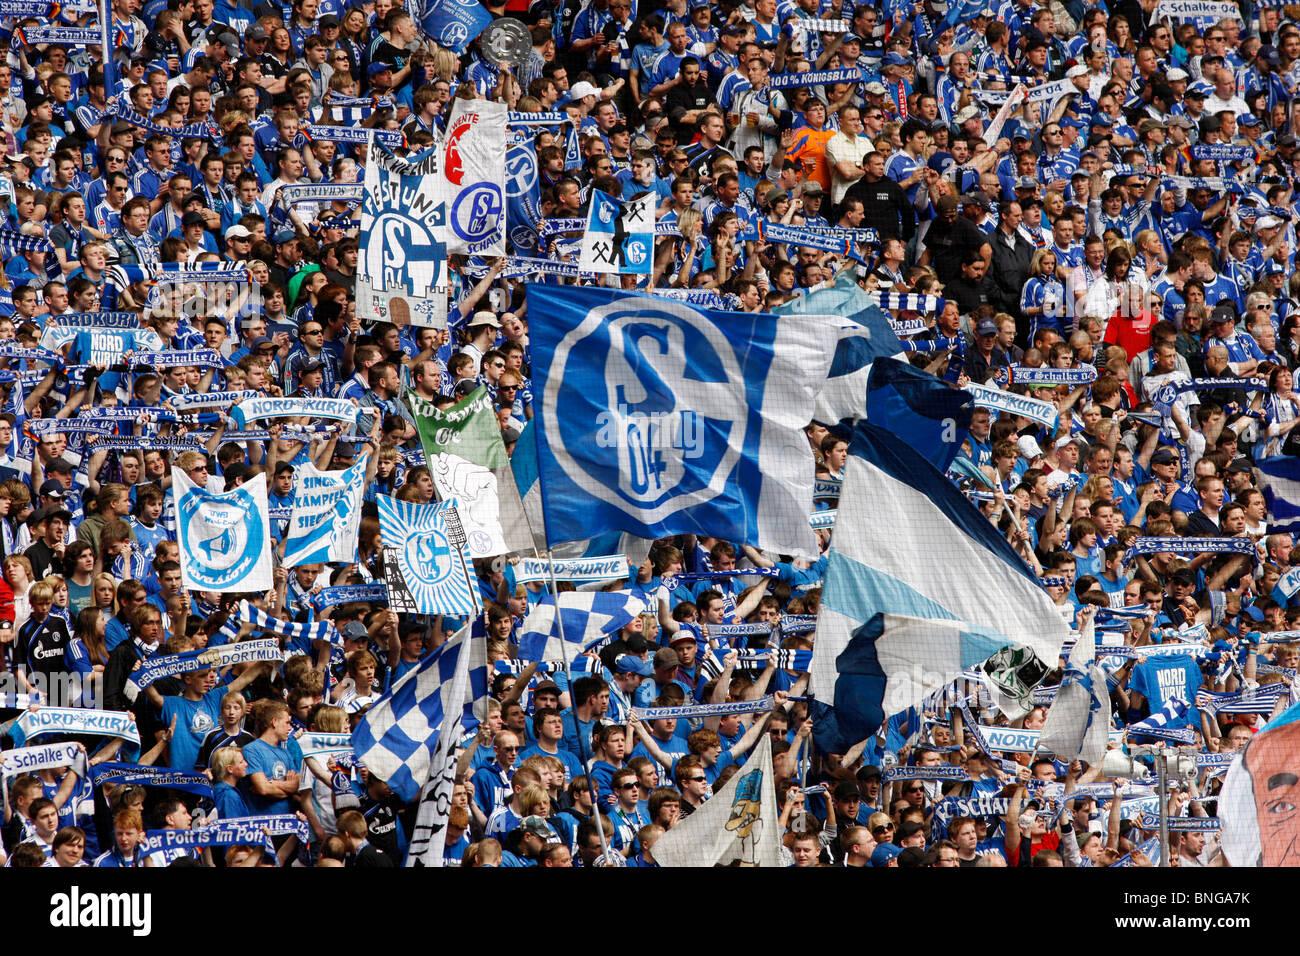 Football, soccer, supporter of German major league football club Schalke 04, in the Veltins Arena stadium. - Stock Image